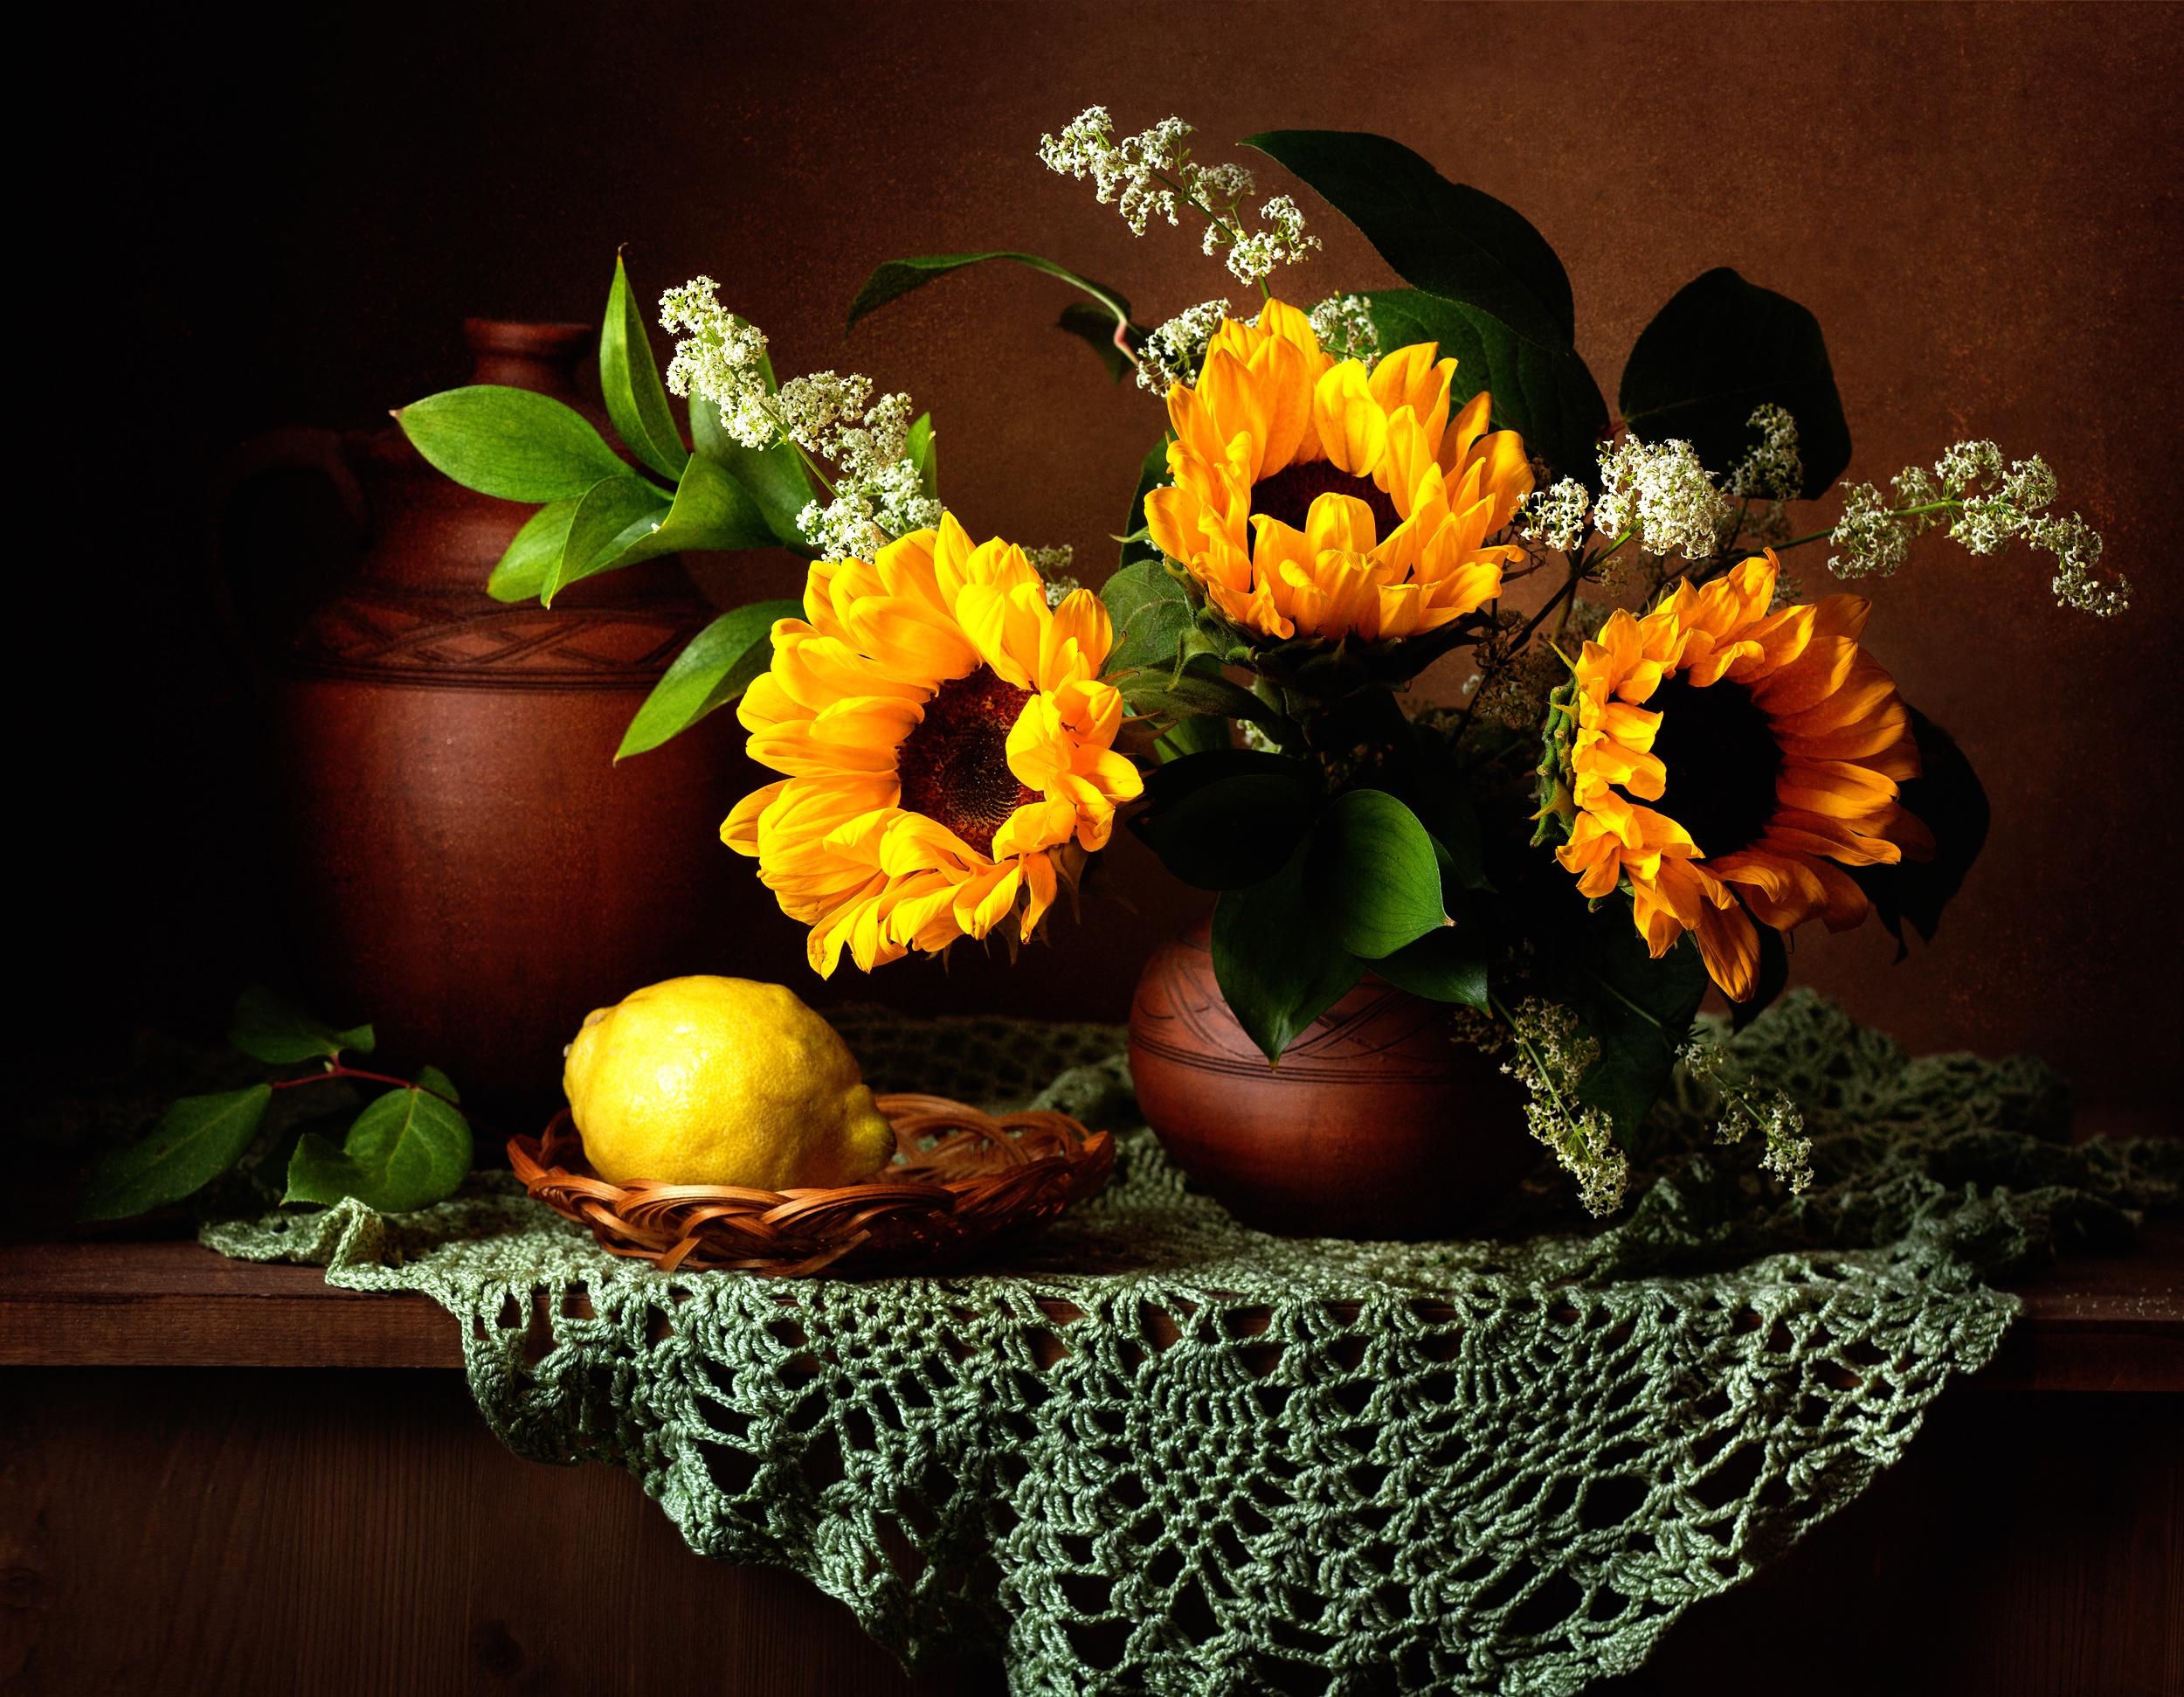 стол, ваза, цветы, лимон без смс